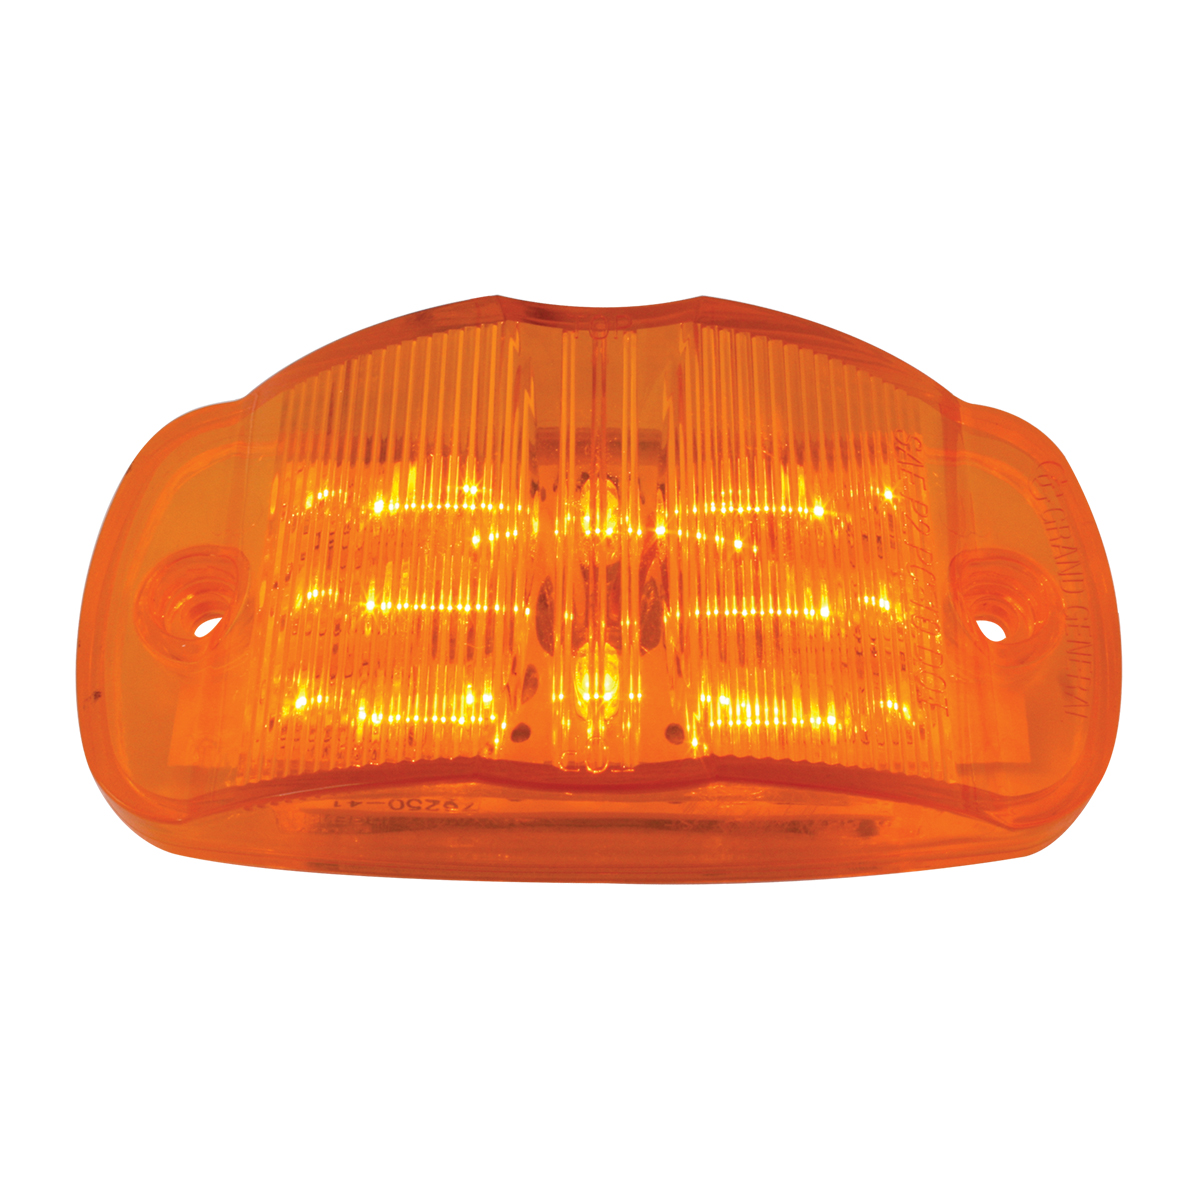 1 Pack Amber Spyder 11-LED, Amber Lens; with O Gasket G5000 GG Grand General 77568 Reflector